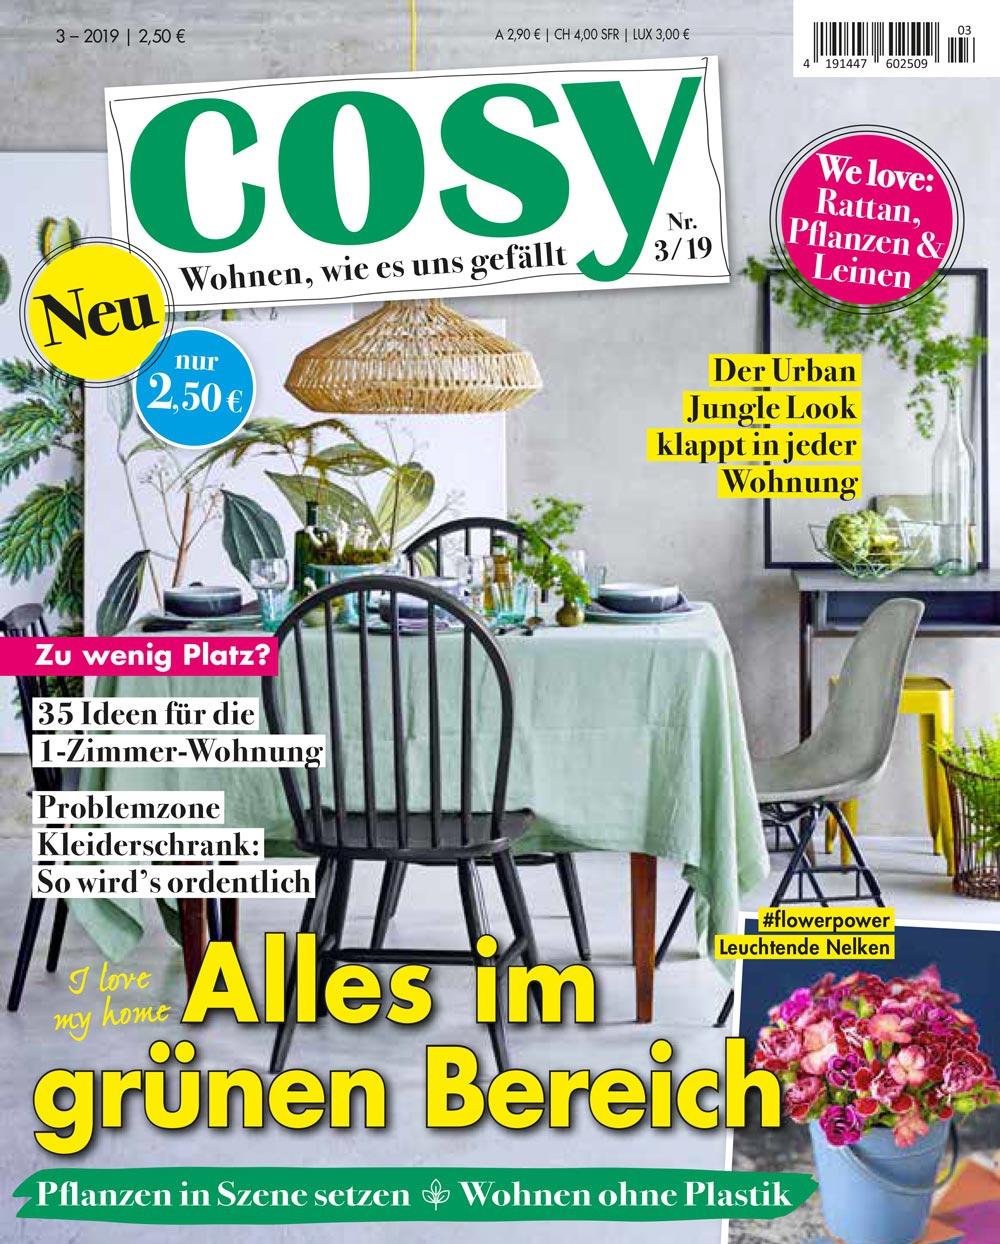 Cover Cosy 03 2019